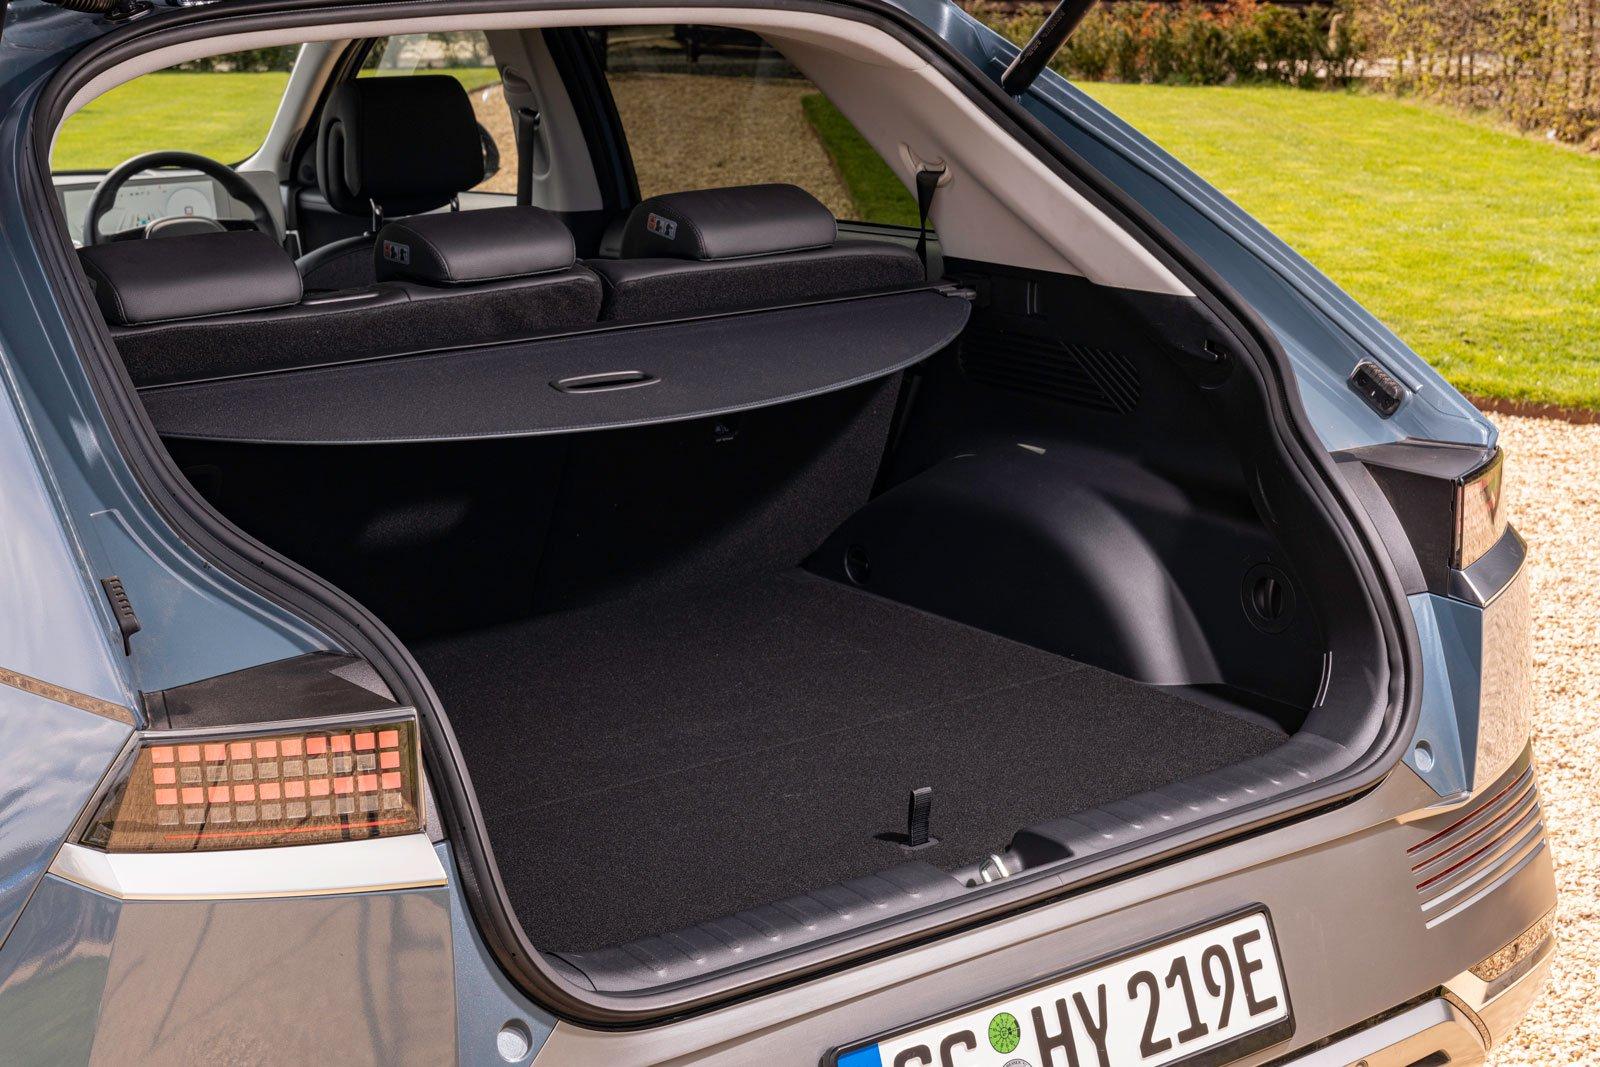 Hyundai Ioniq 5 2021 boot open